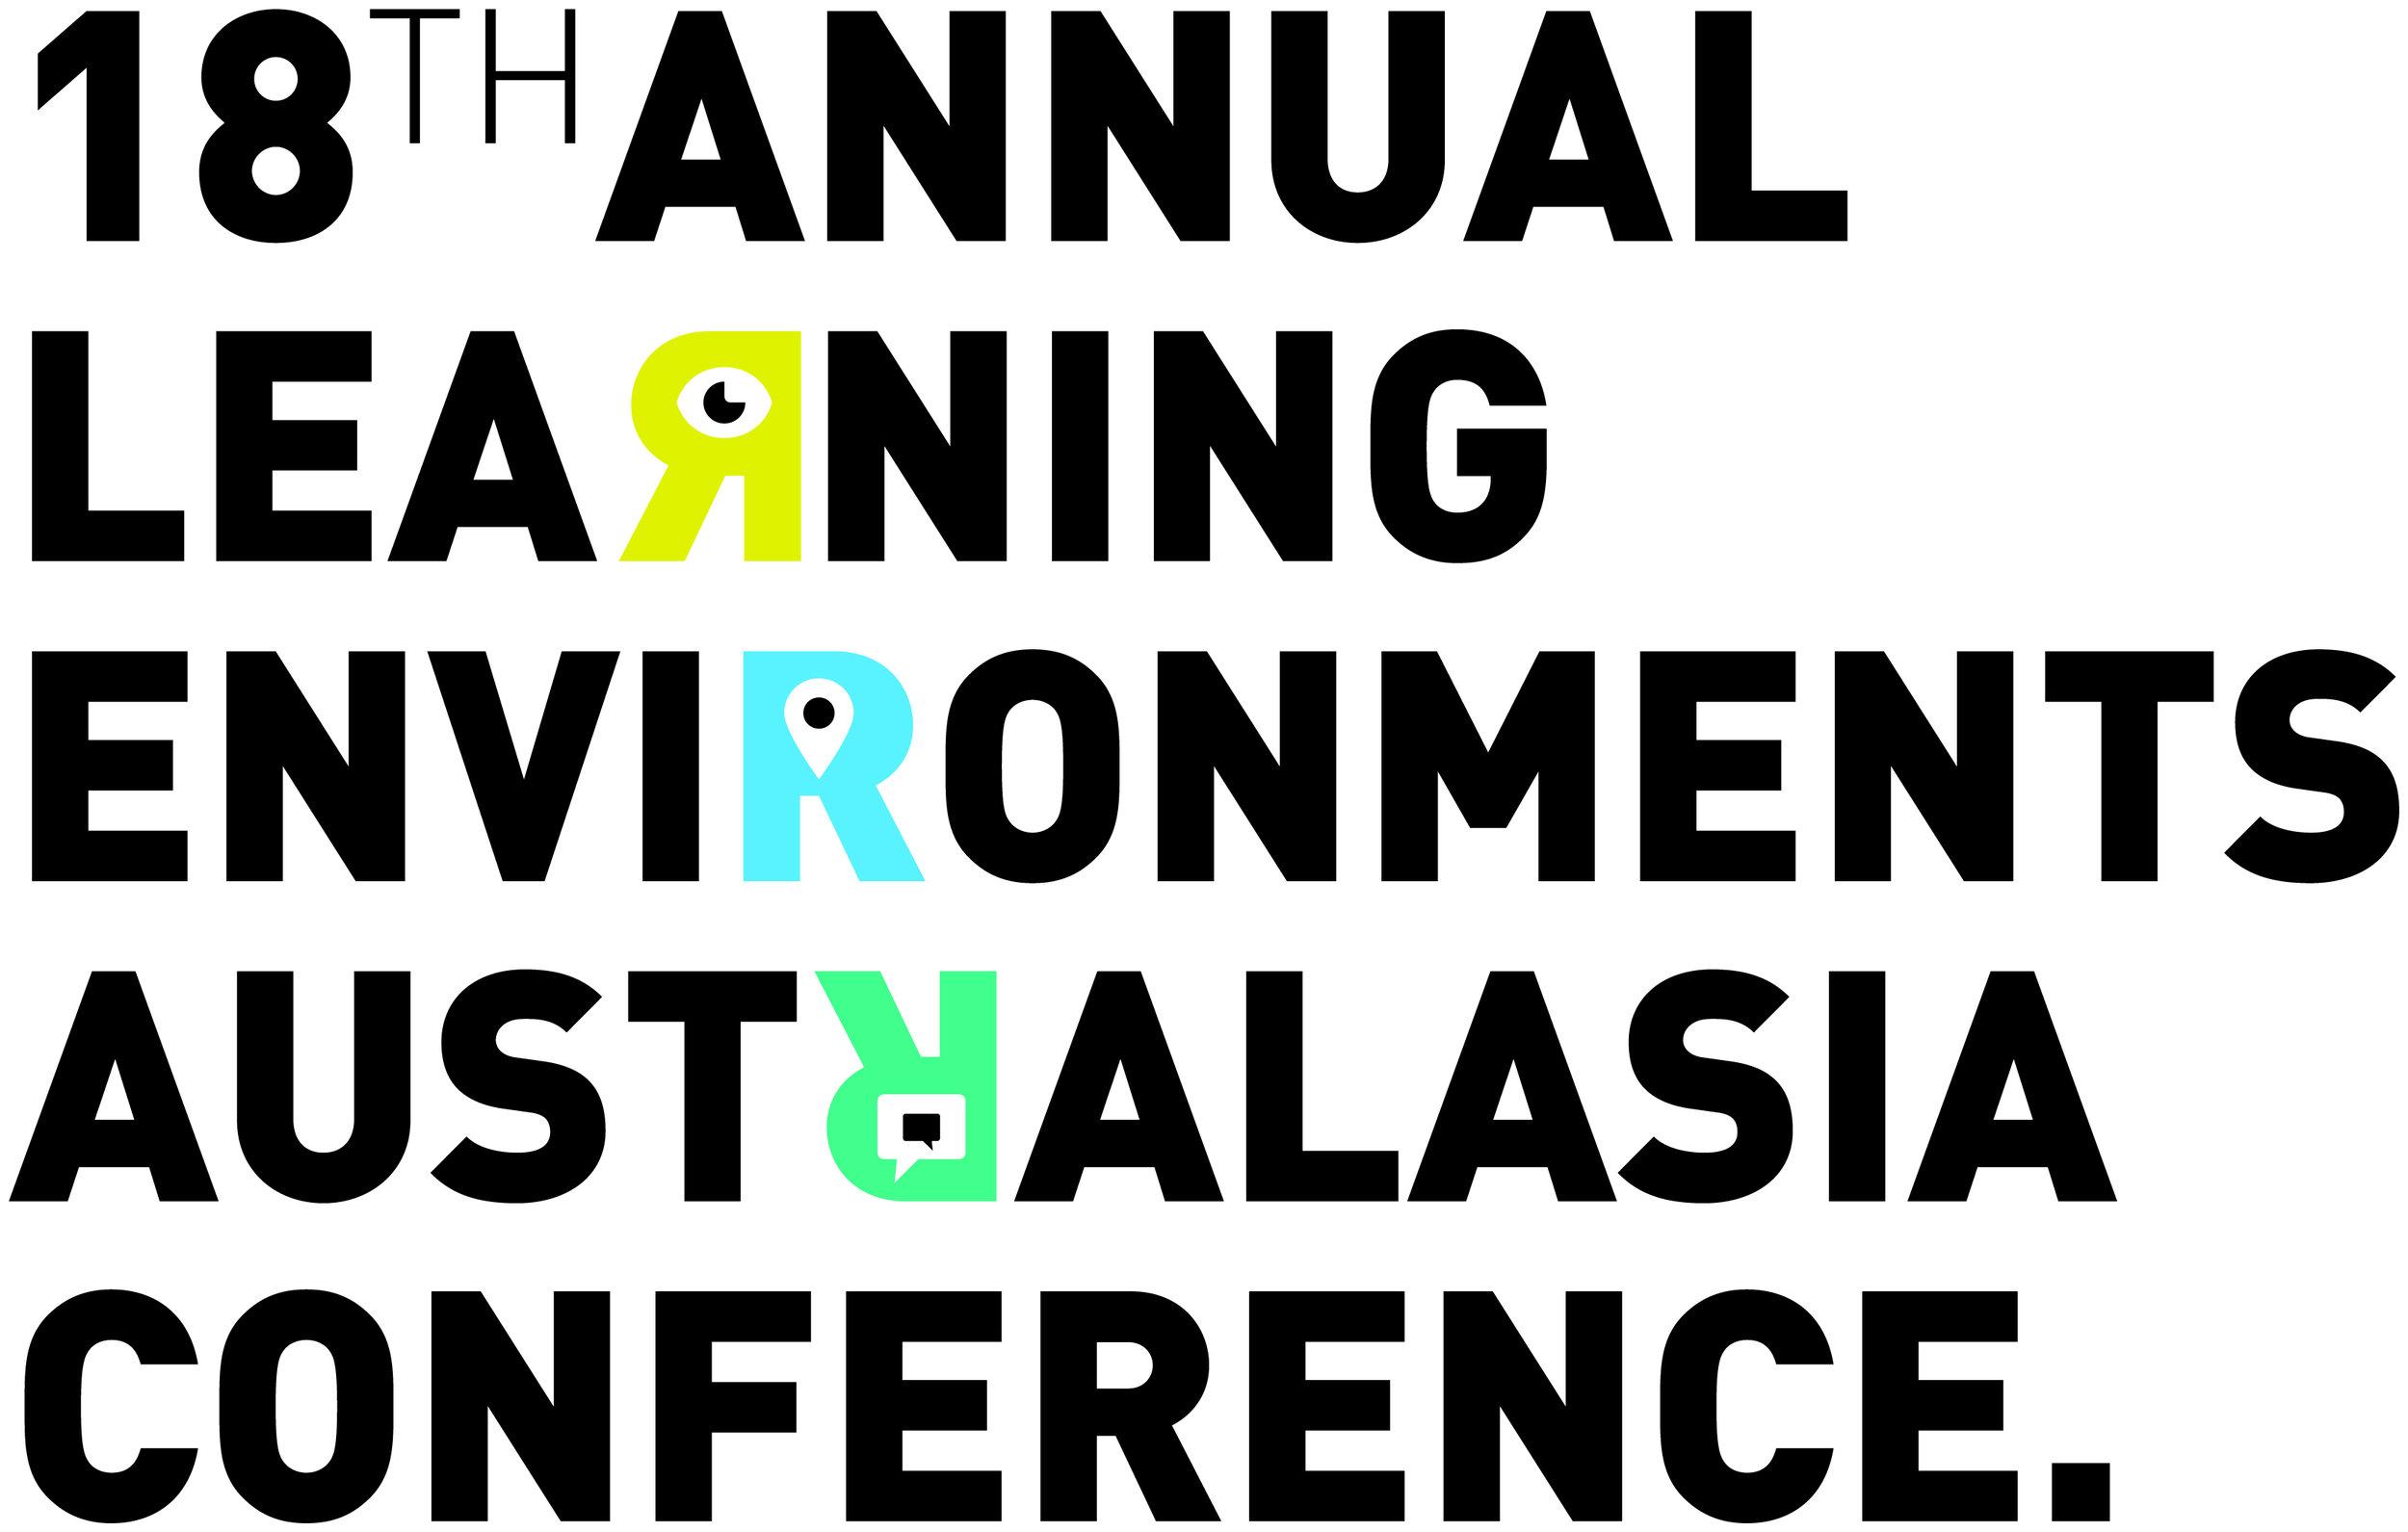 Learning Environments Australasia